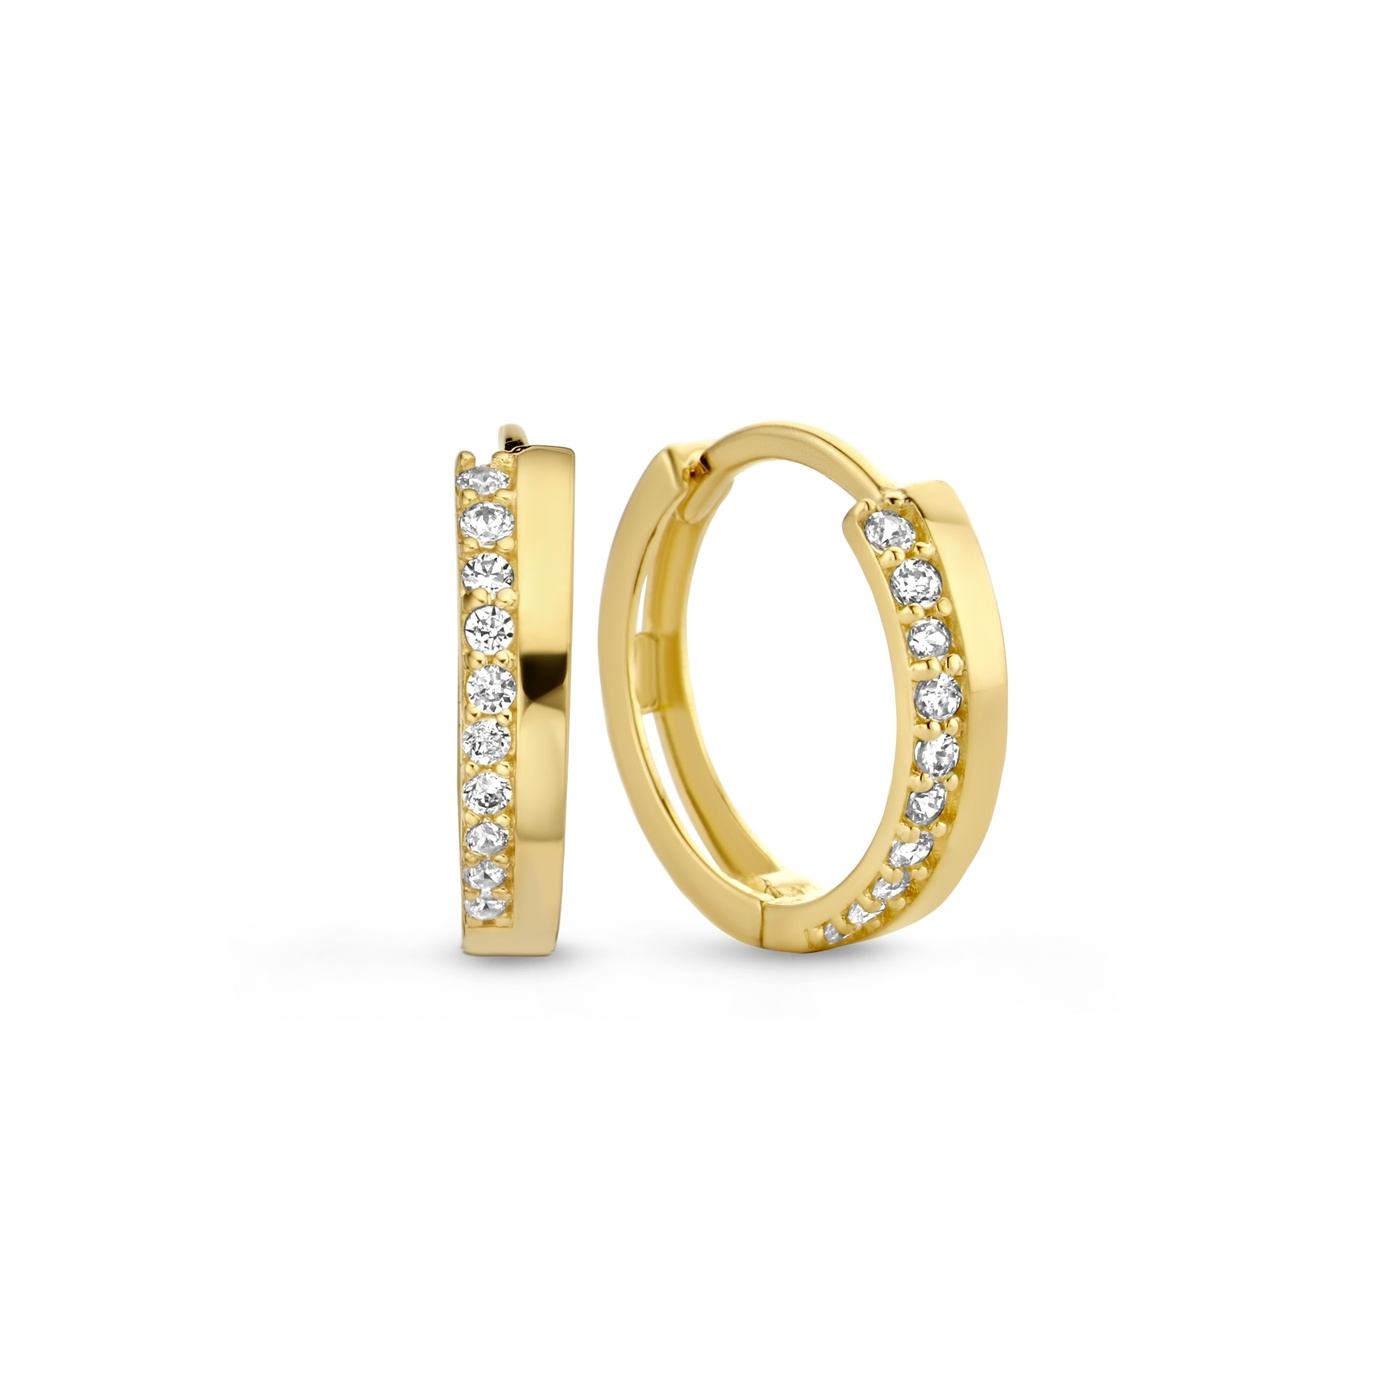 Isabel Bernard Le Marais Louna 14 karat gold hoop earrings with zirconia